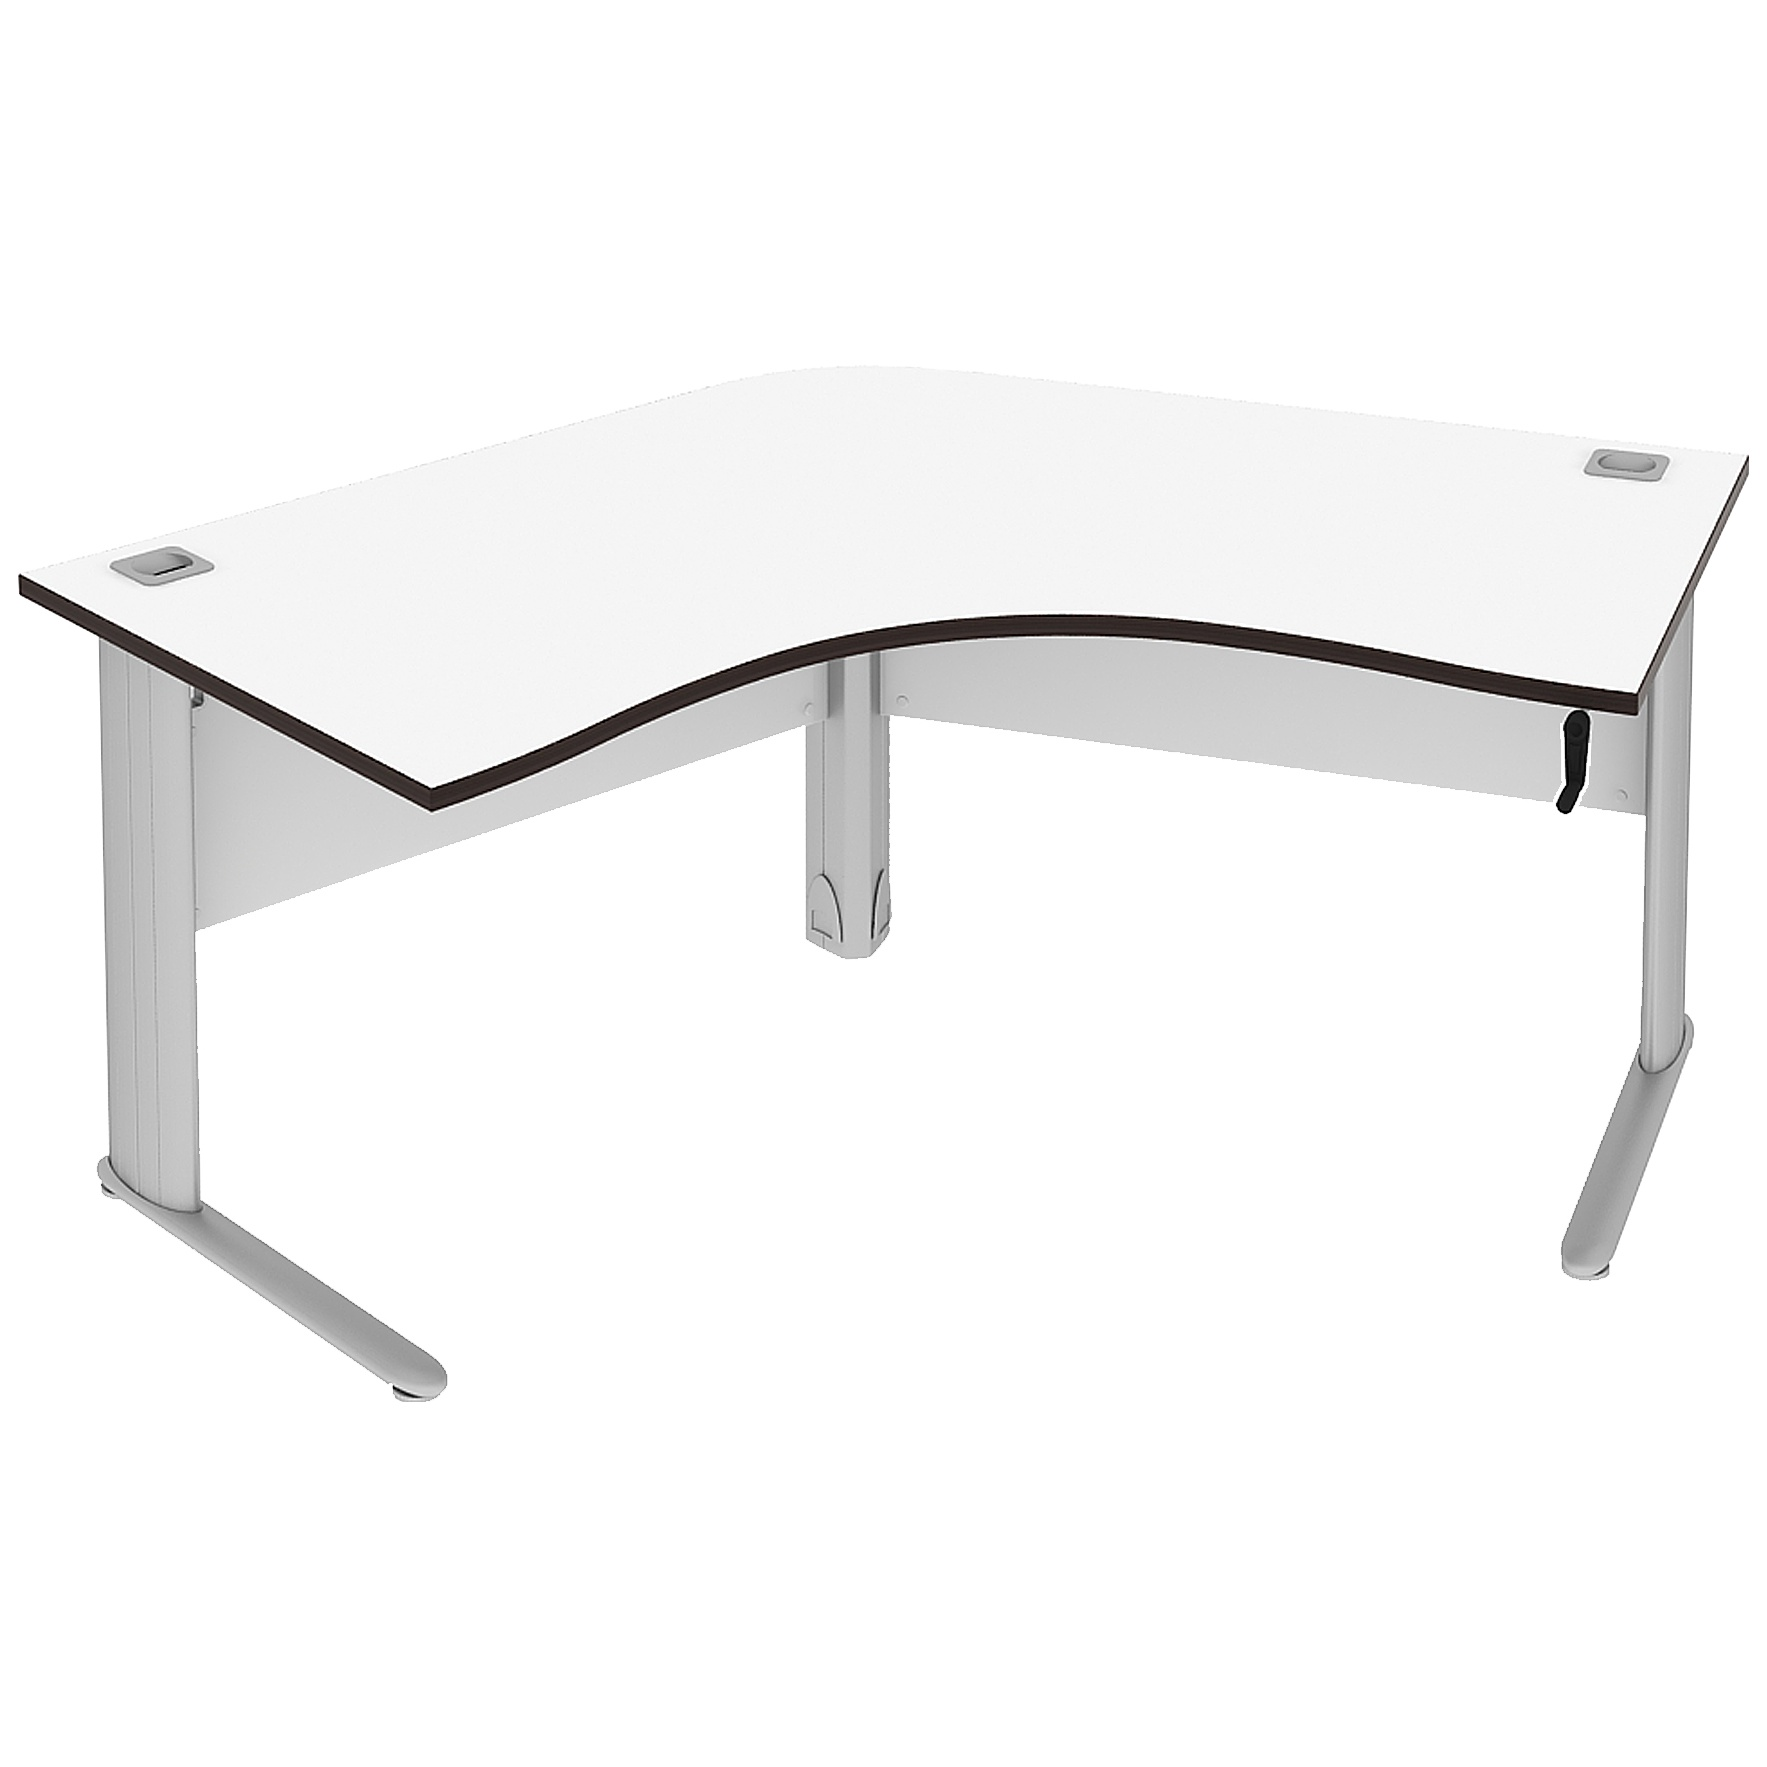 Elite Optima Plus Height Adjustable 120 Degree Workstations Cluster Desks